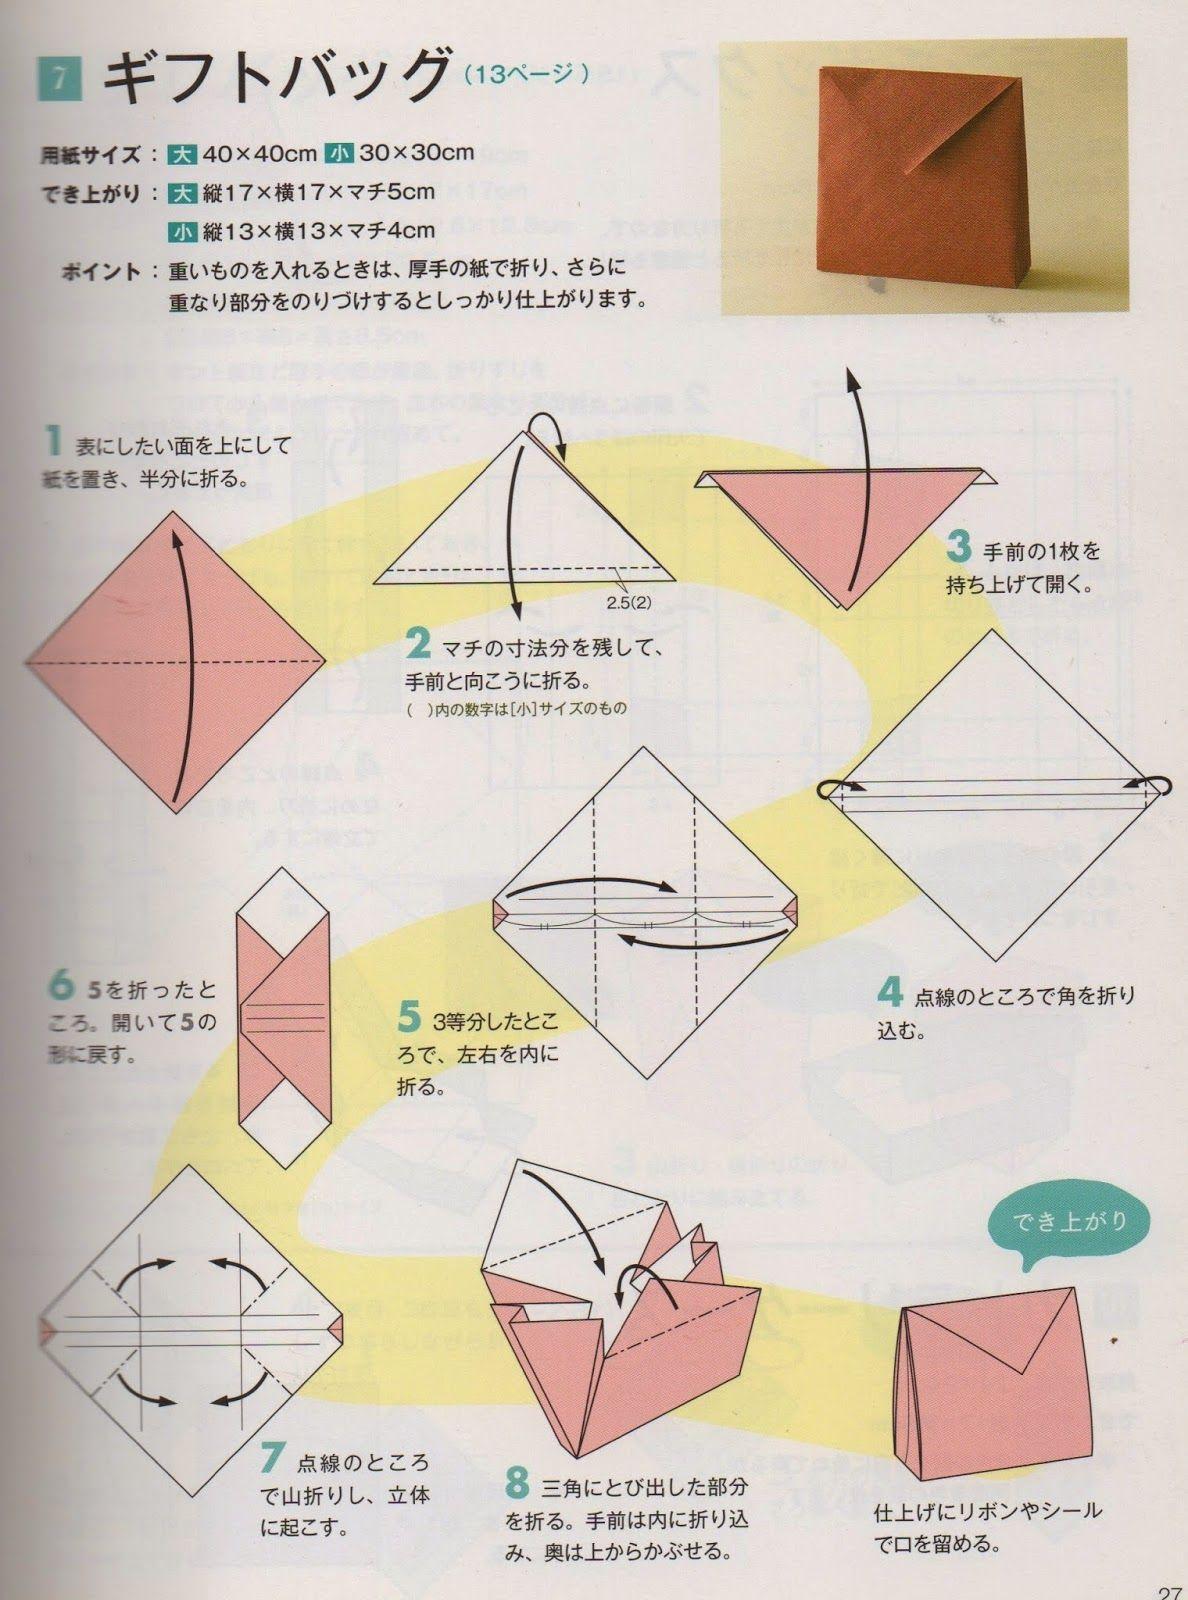 Origami Purse Diagram Electrical Work Wiring Diagram